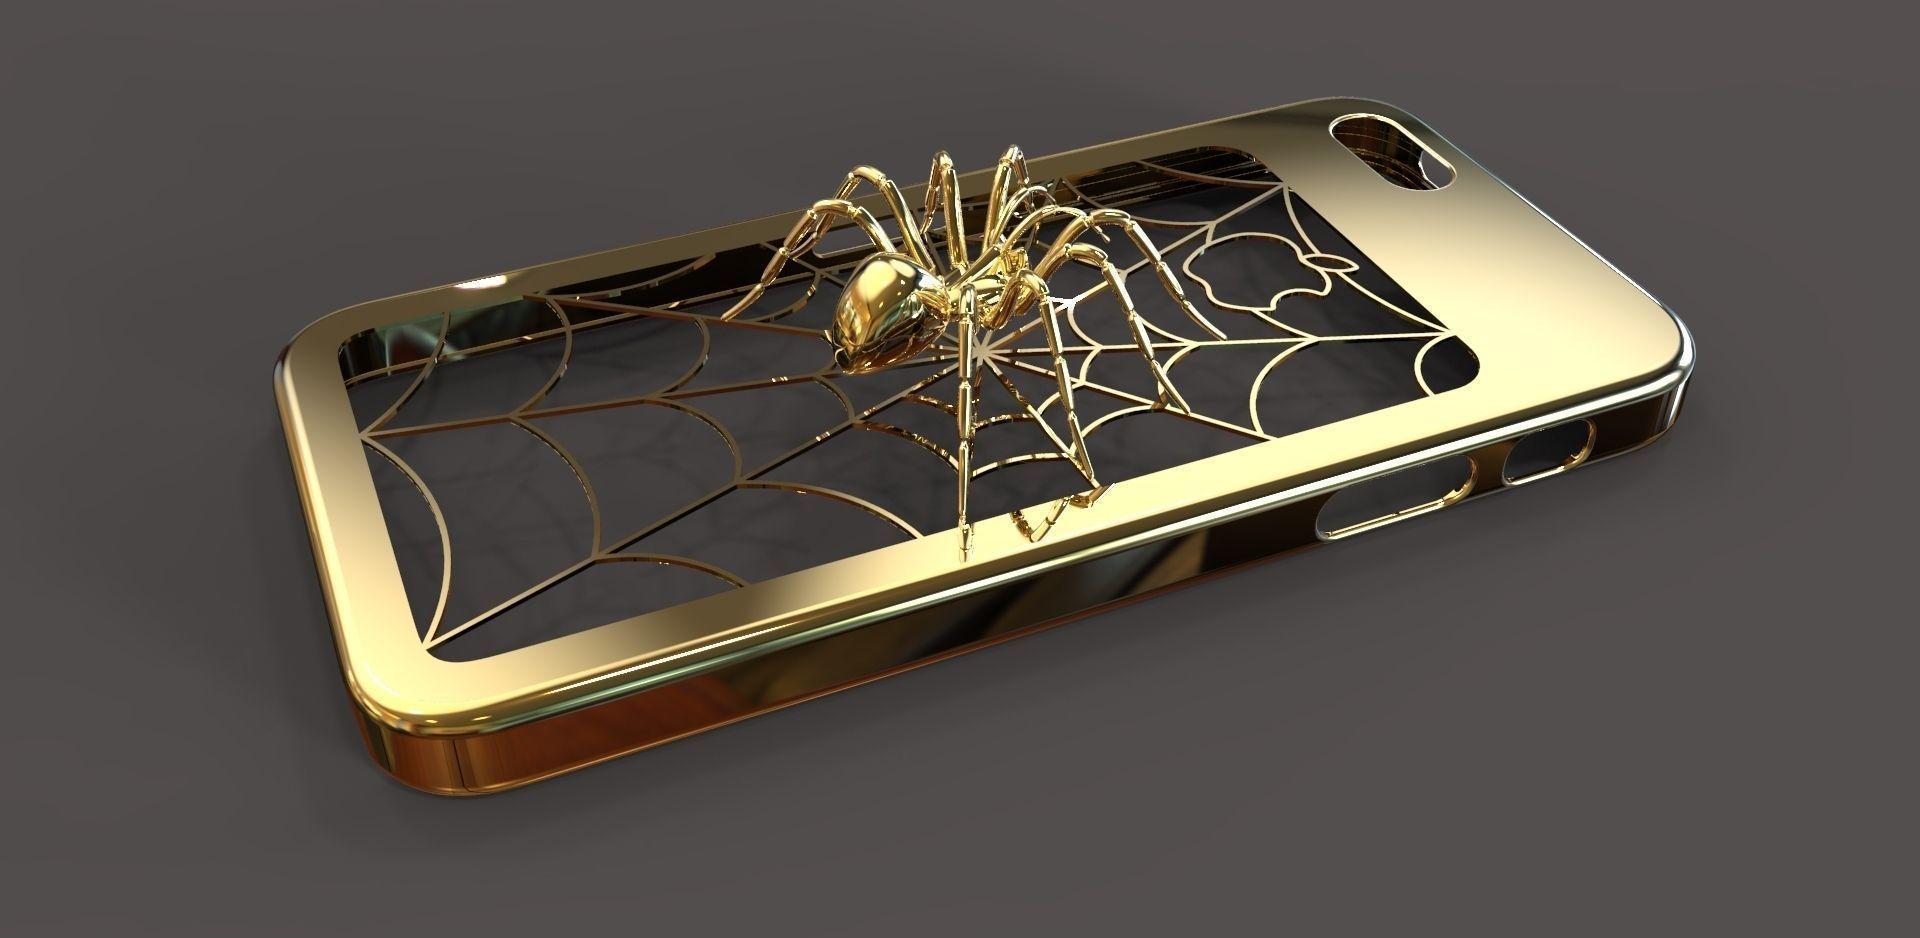 Iphone 5 Spider Case 3d Model 3d Printable Wrl Wrz